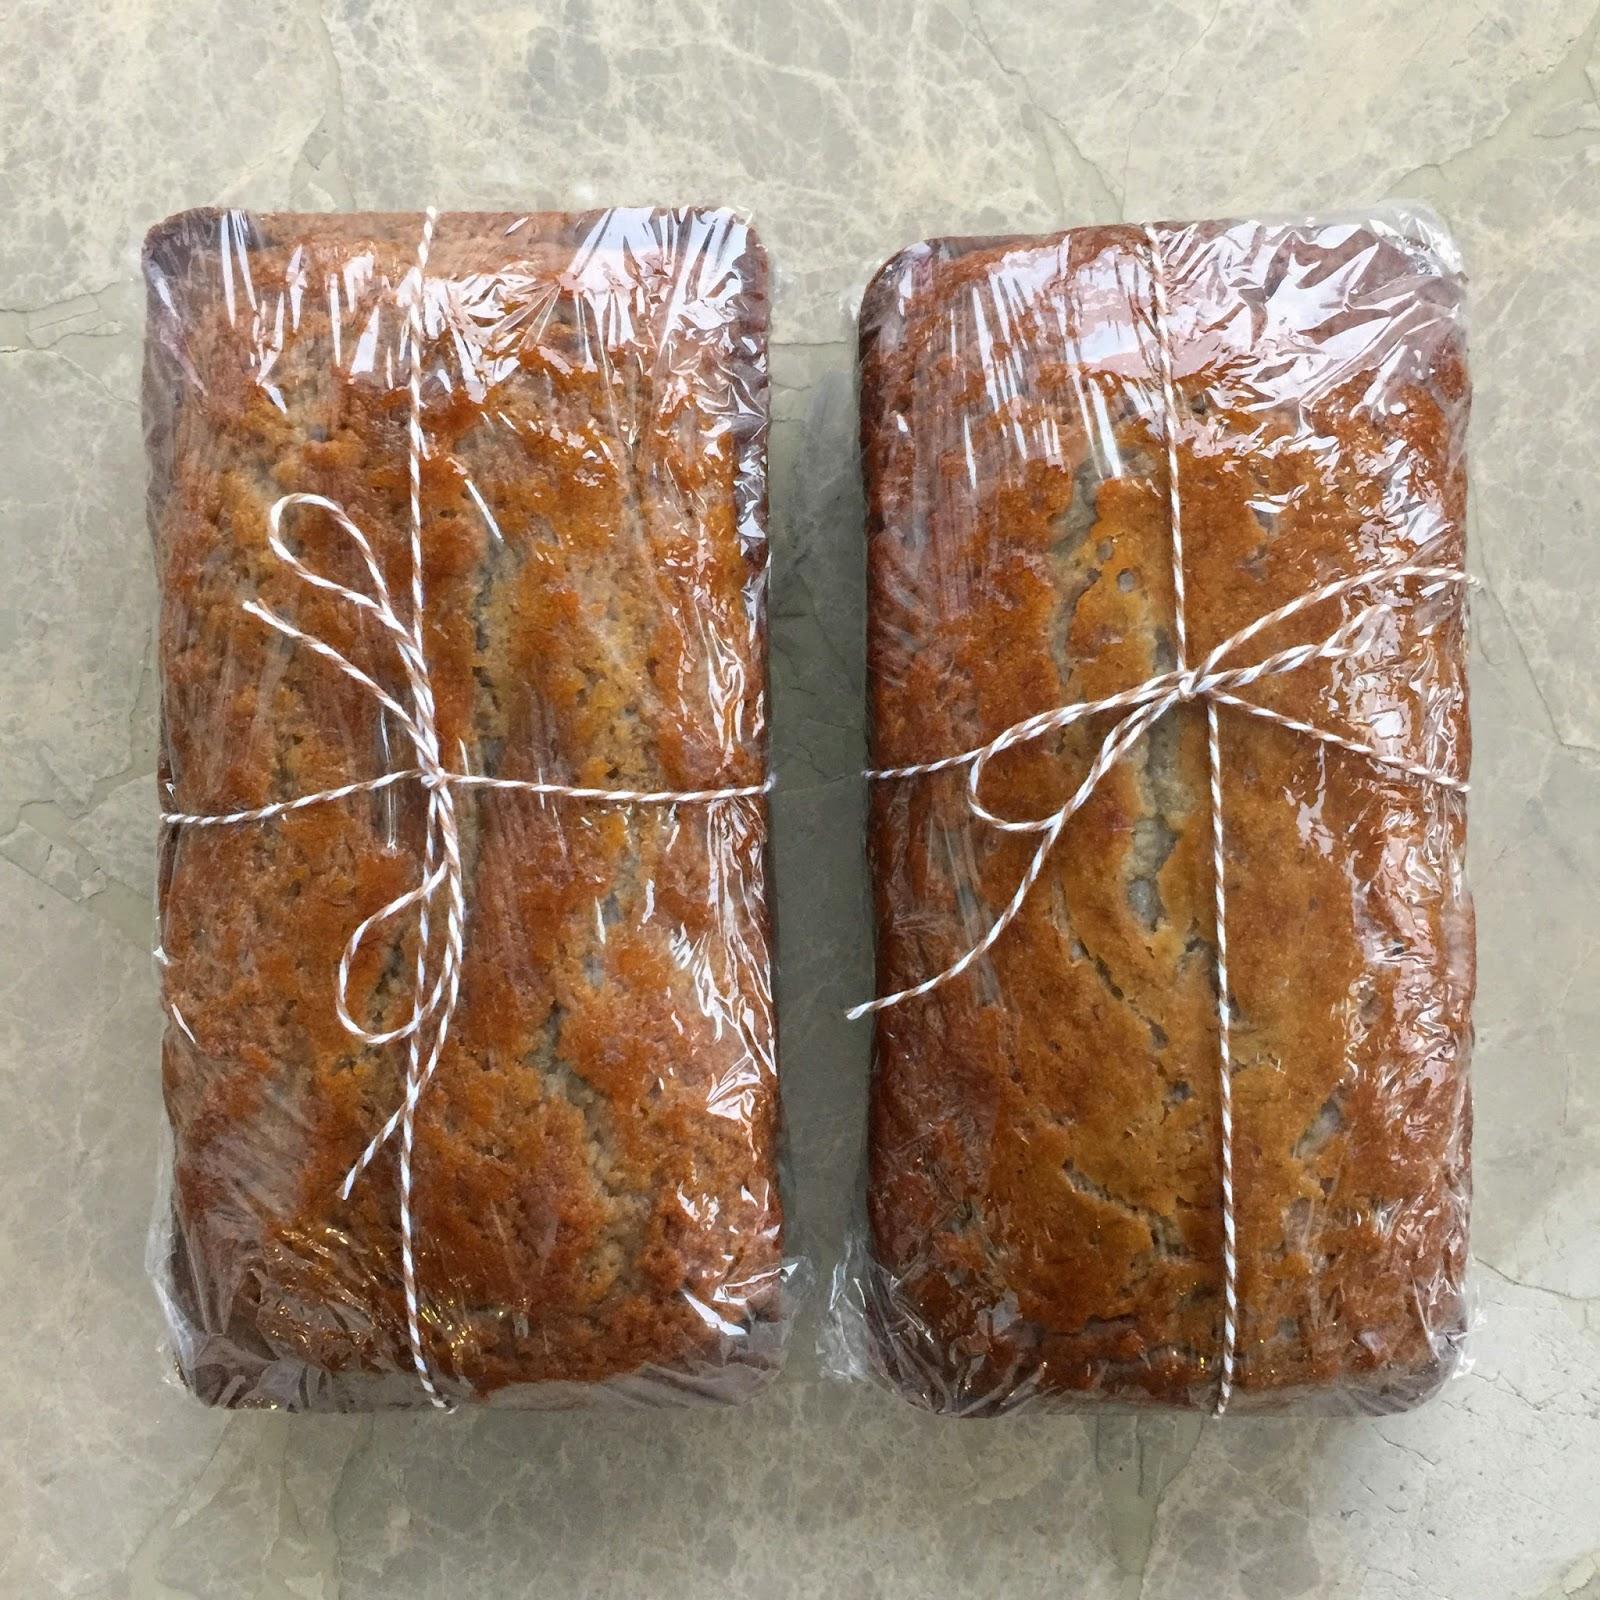 A Bountiful Kitchen Bread